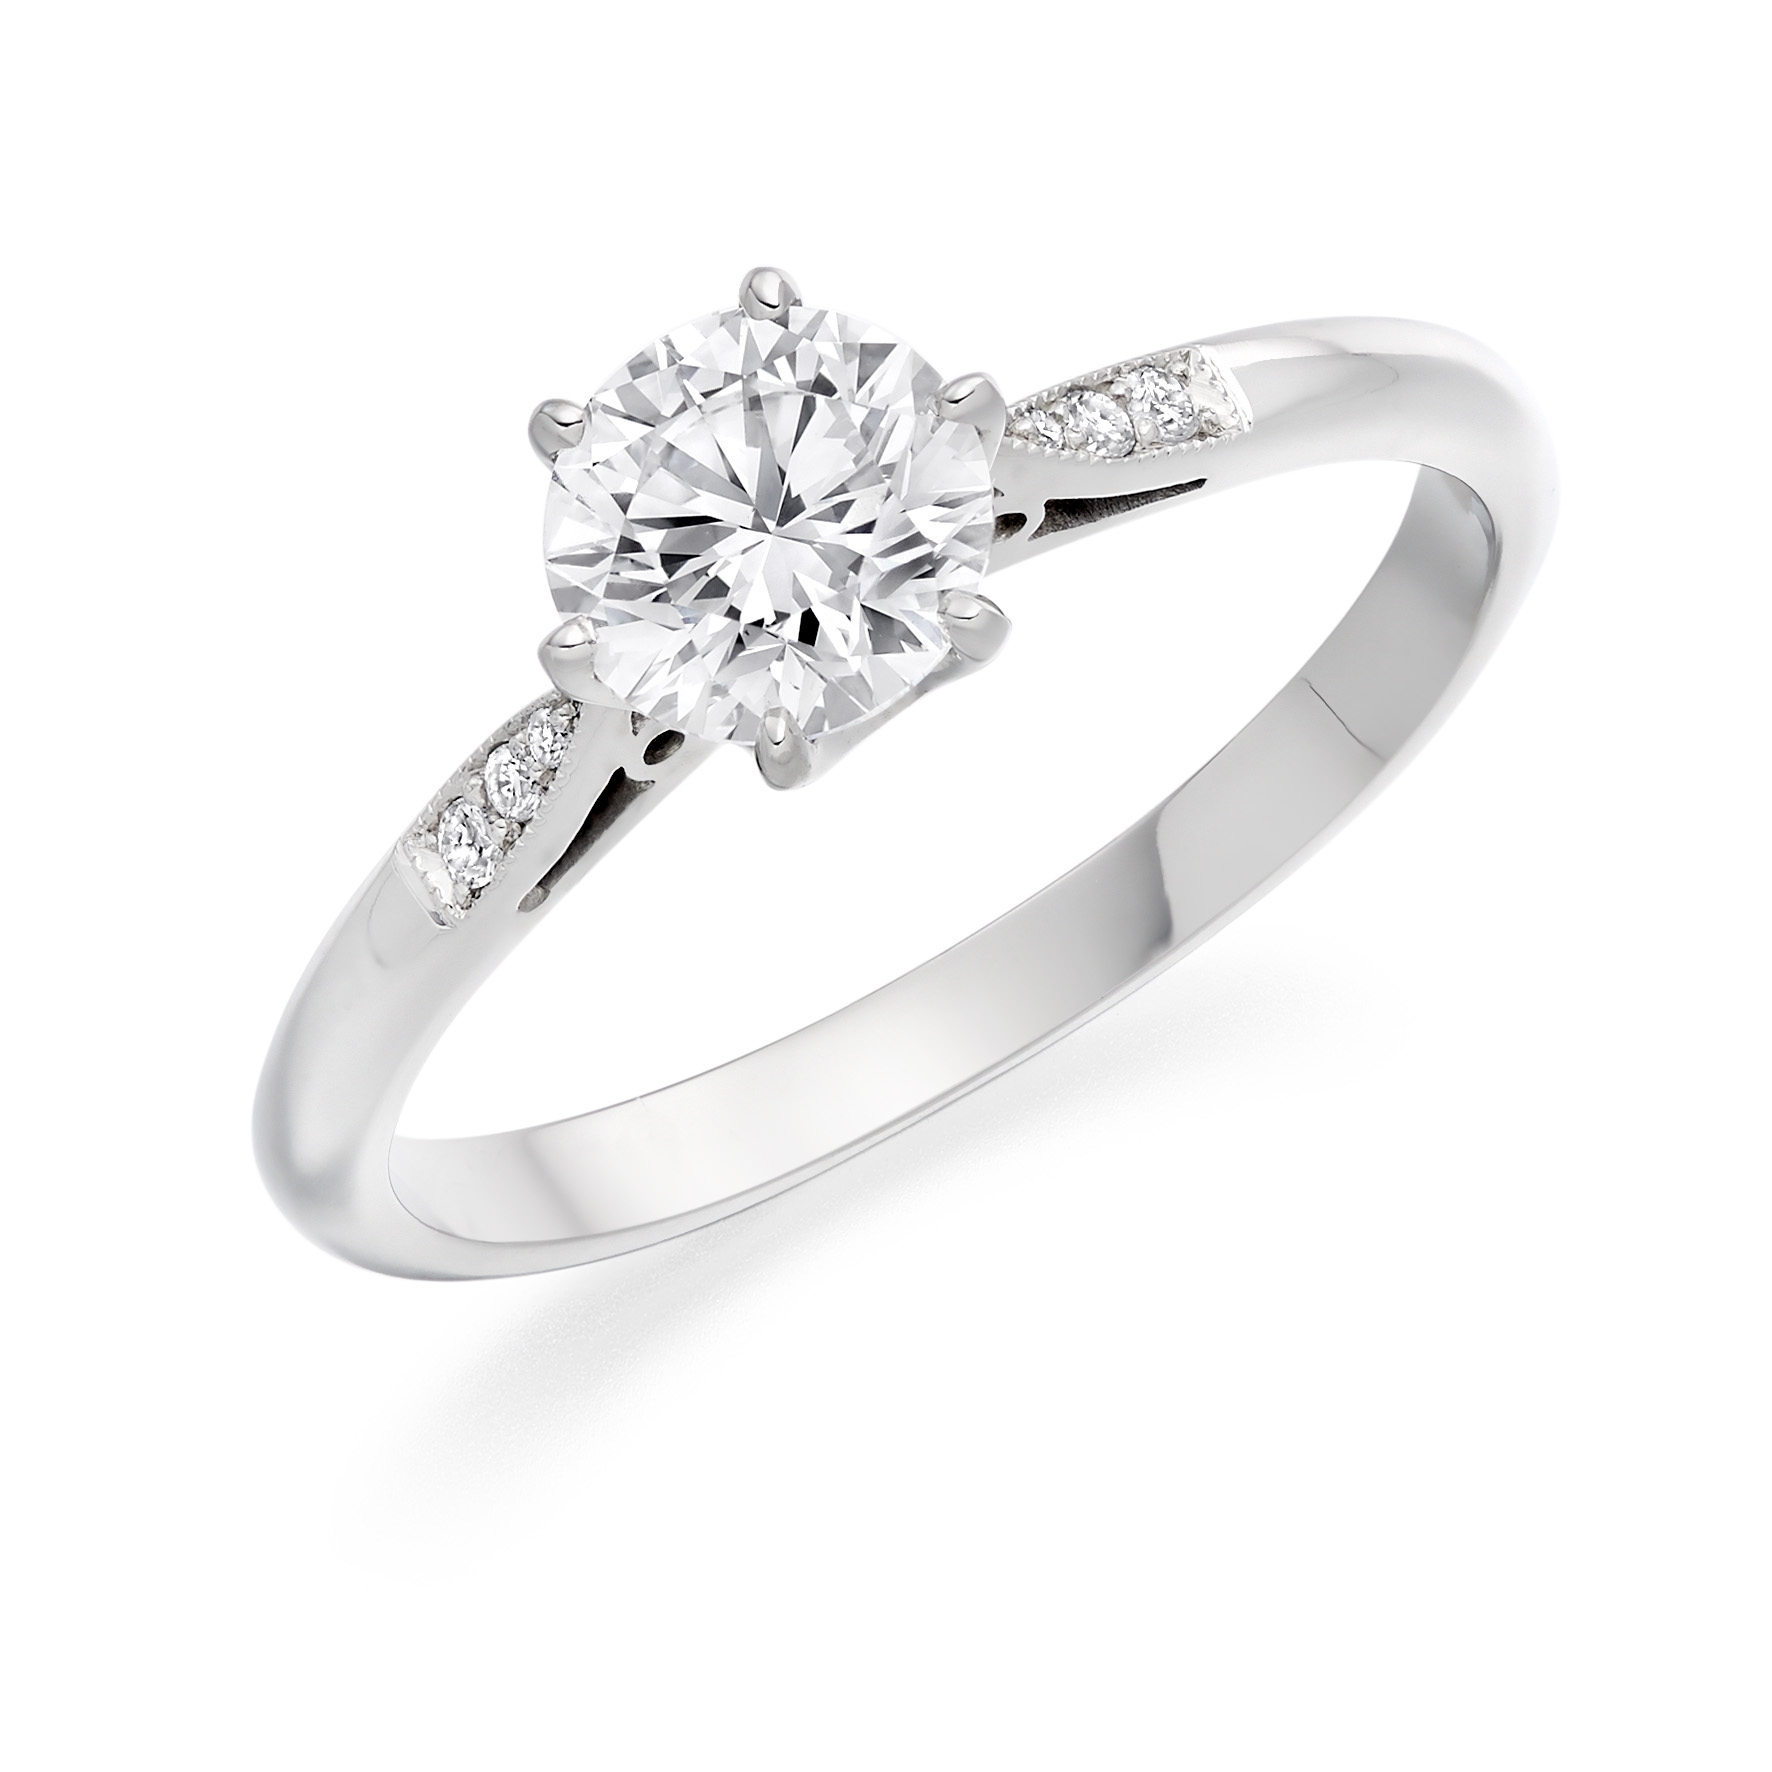 Engagement Rings in Hatton Garden, London